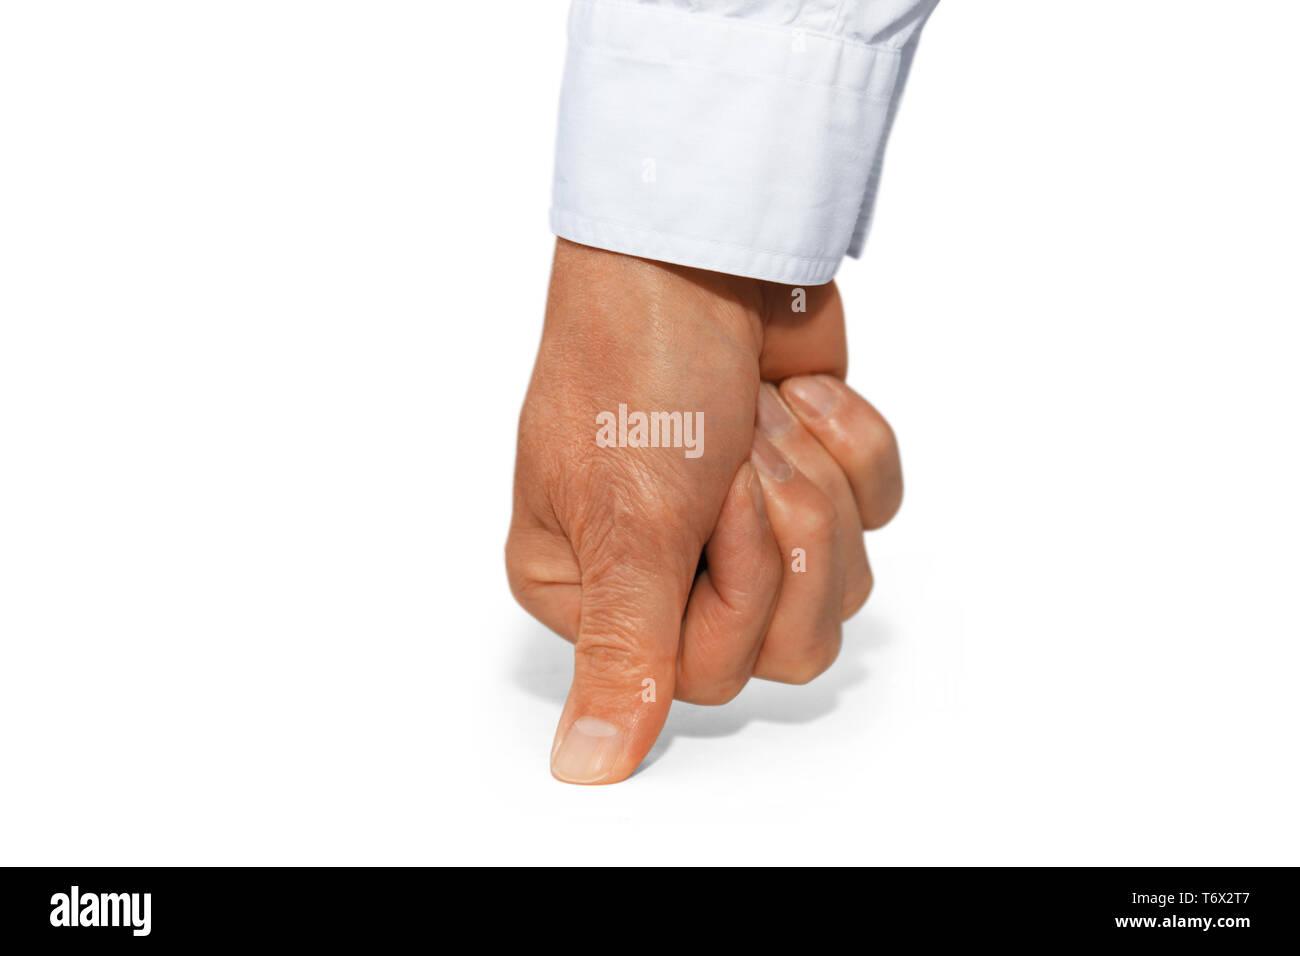 Gestenserie: Fingers crossed - Stock Image